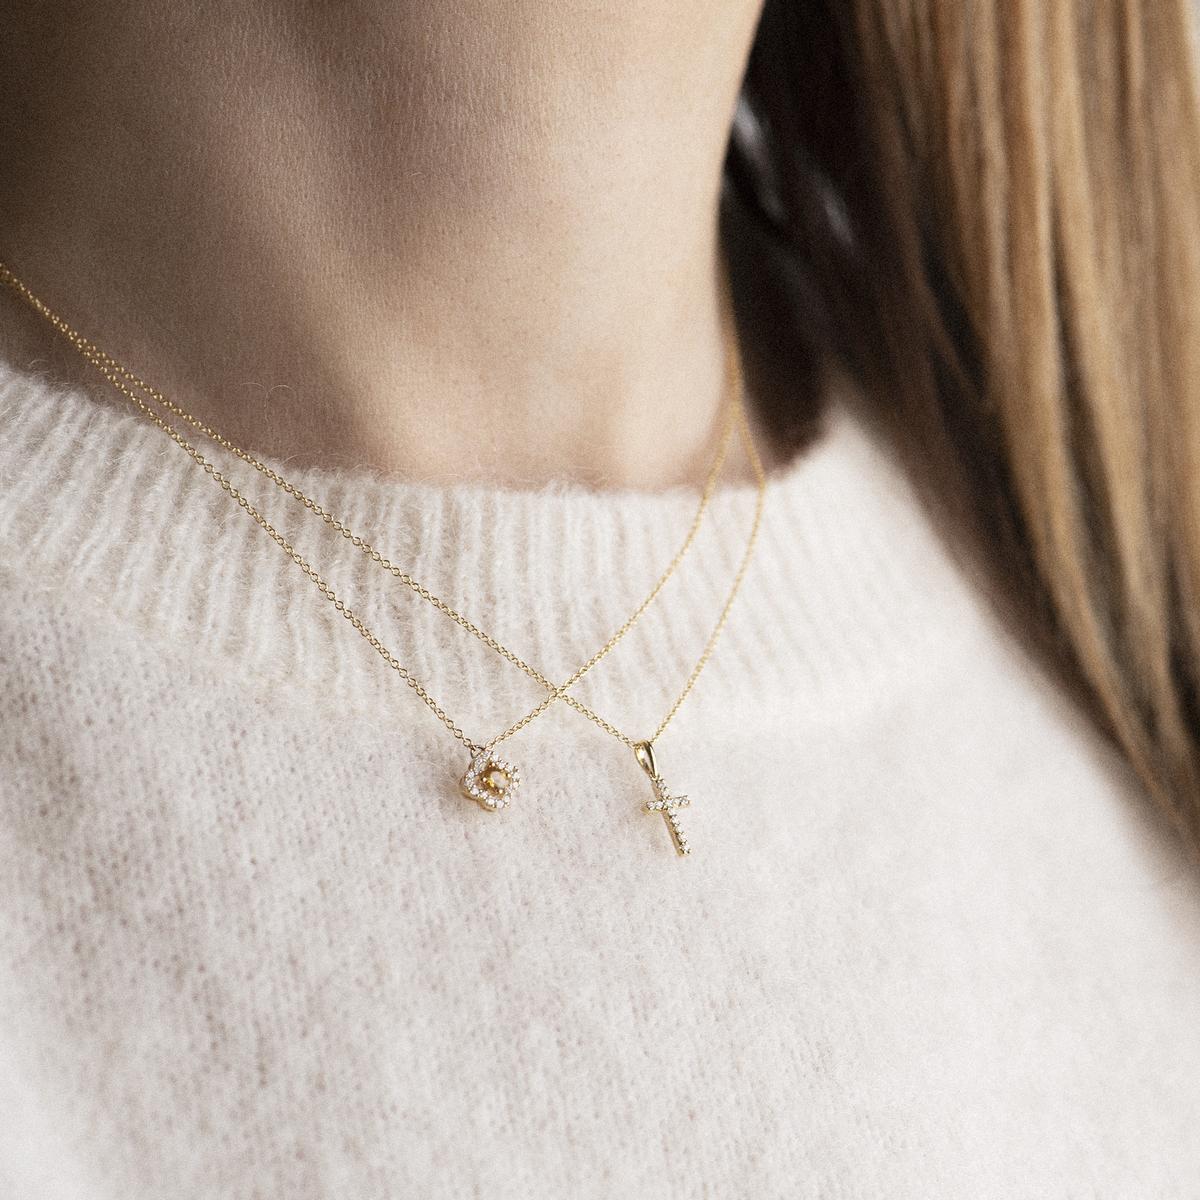 ischia basics pendant in yellow gold